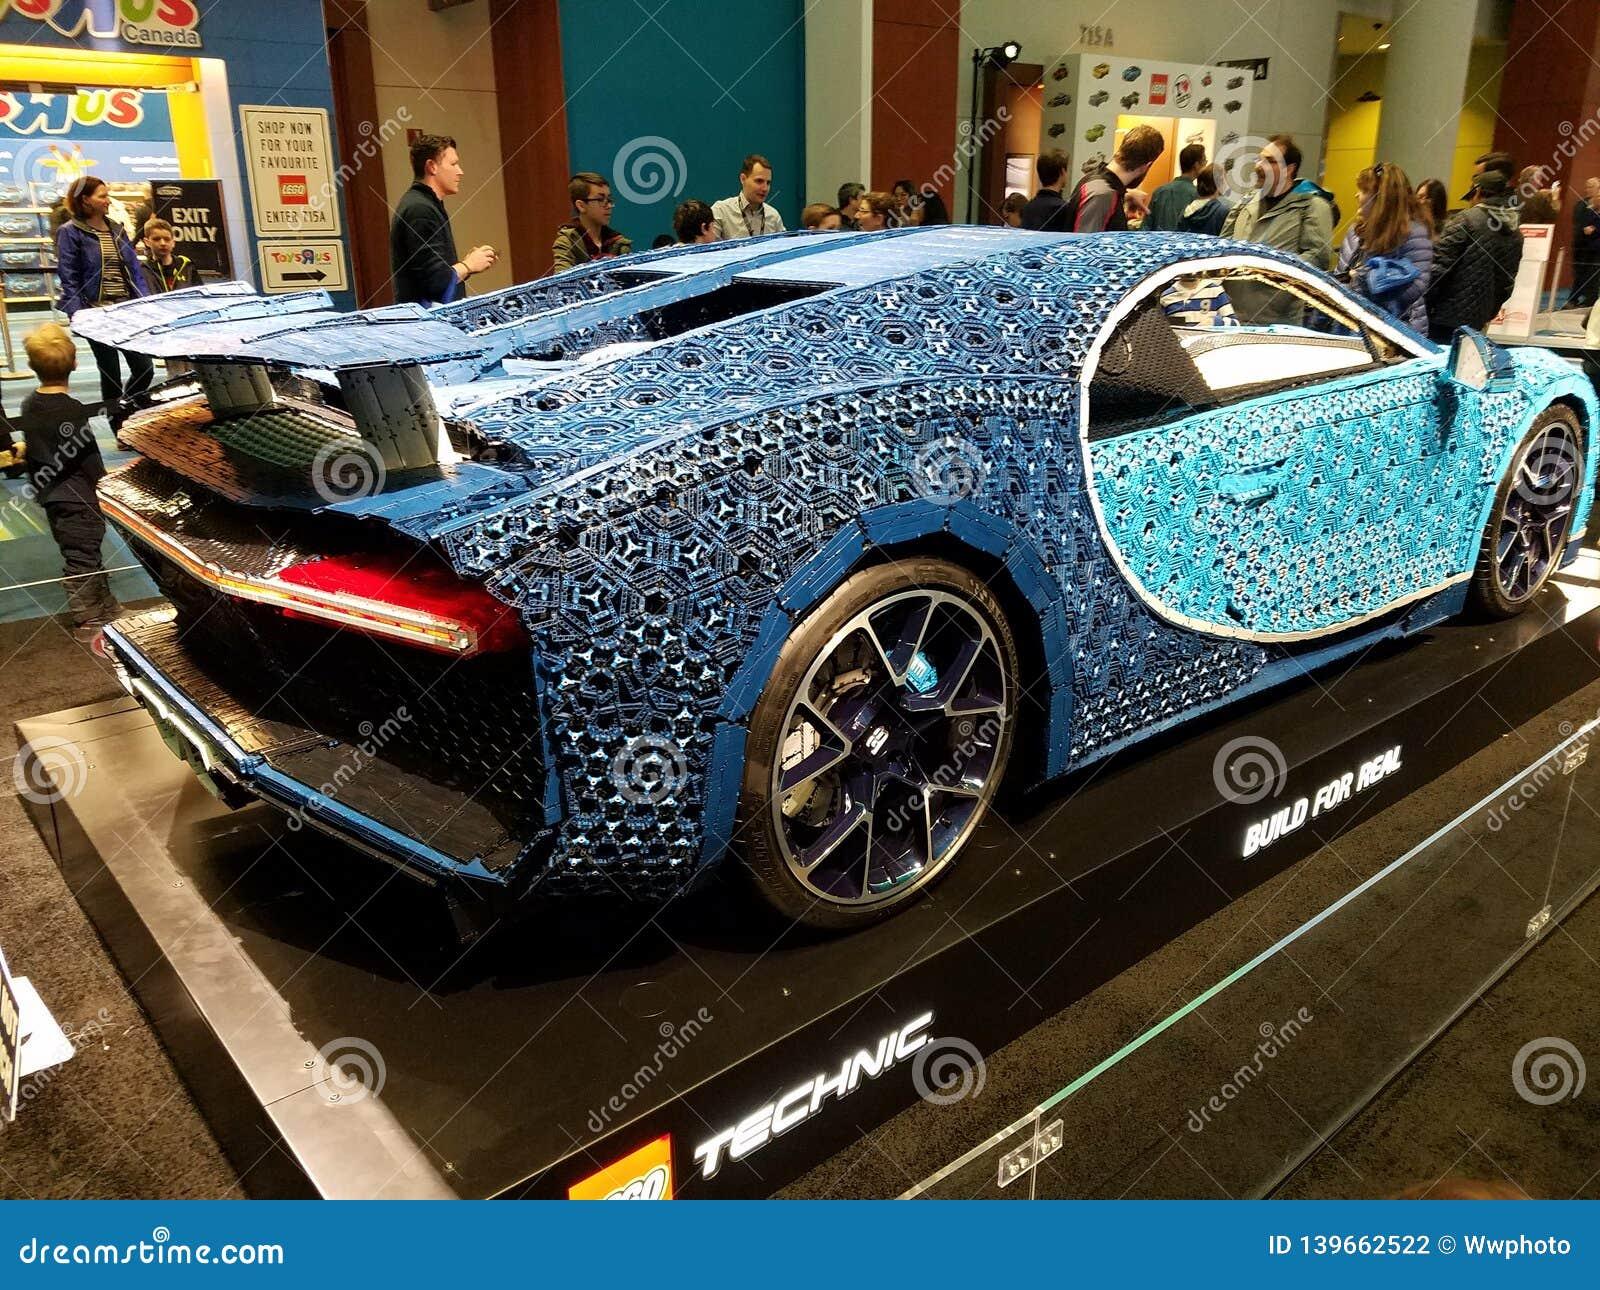 Lego Technic Bugatti Chiron Editorial Photography Image Of Chiron